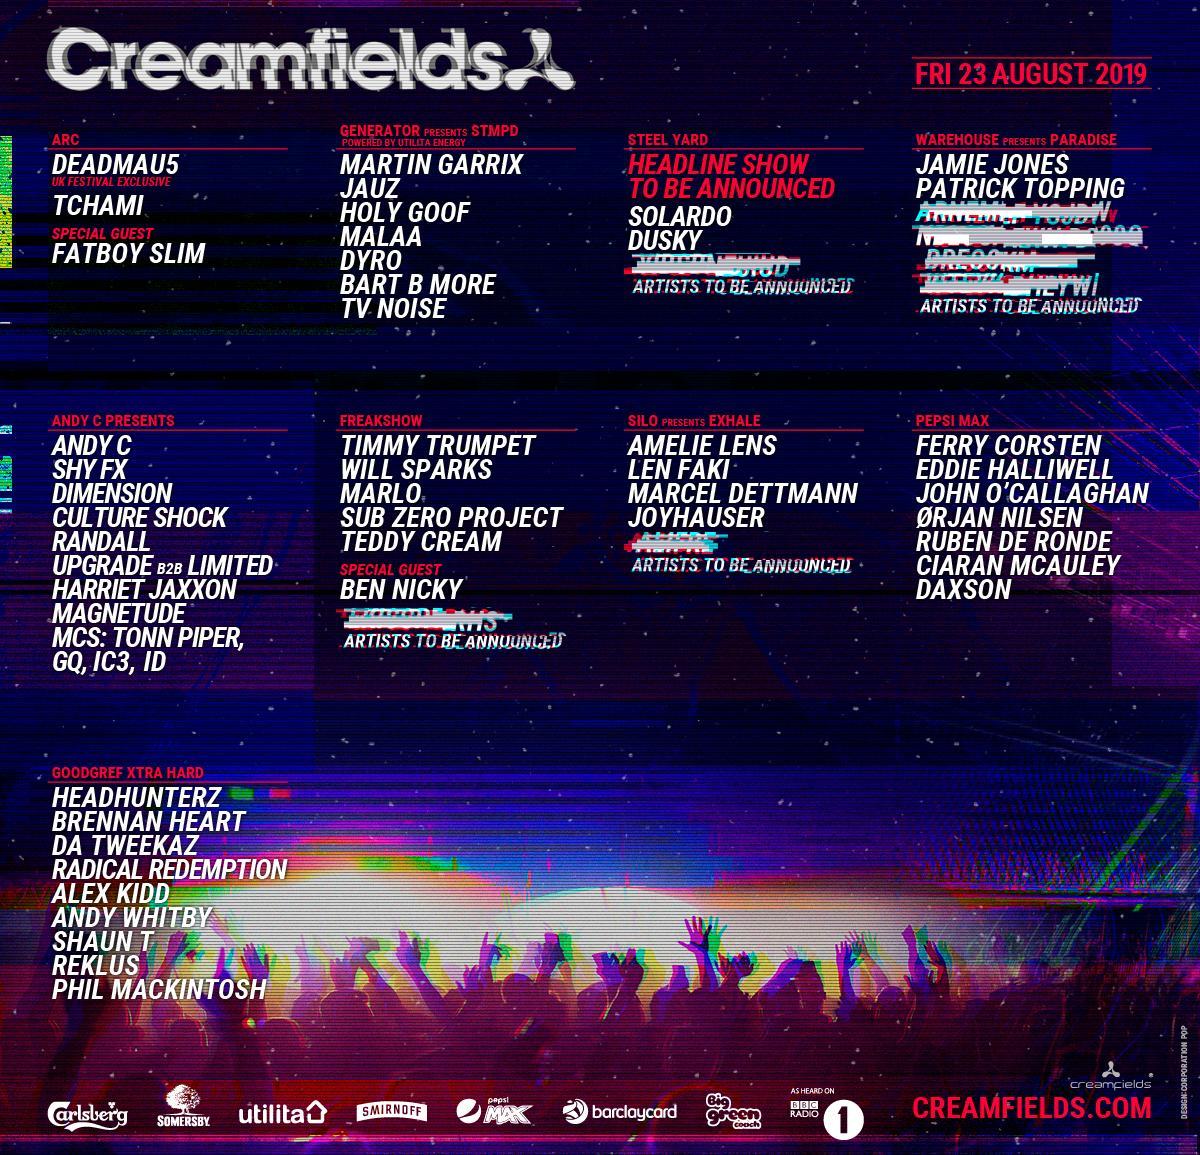 Creamfields 2019 Lineup - Friday